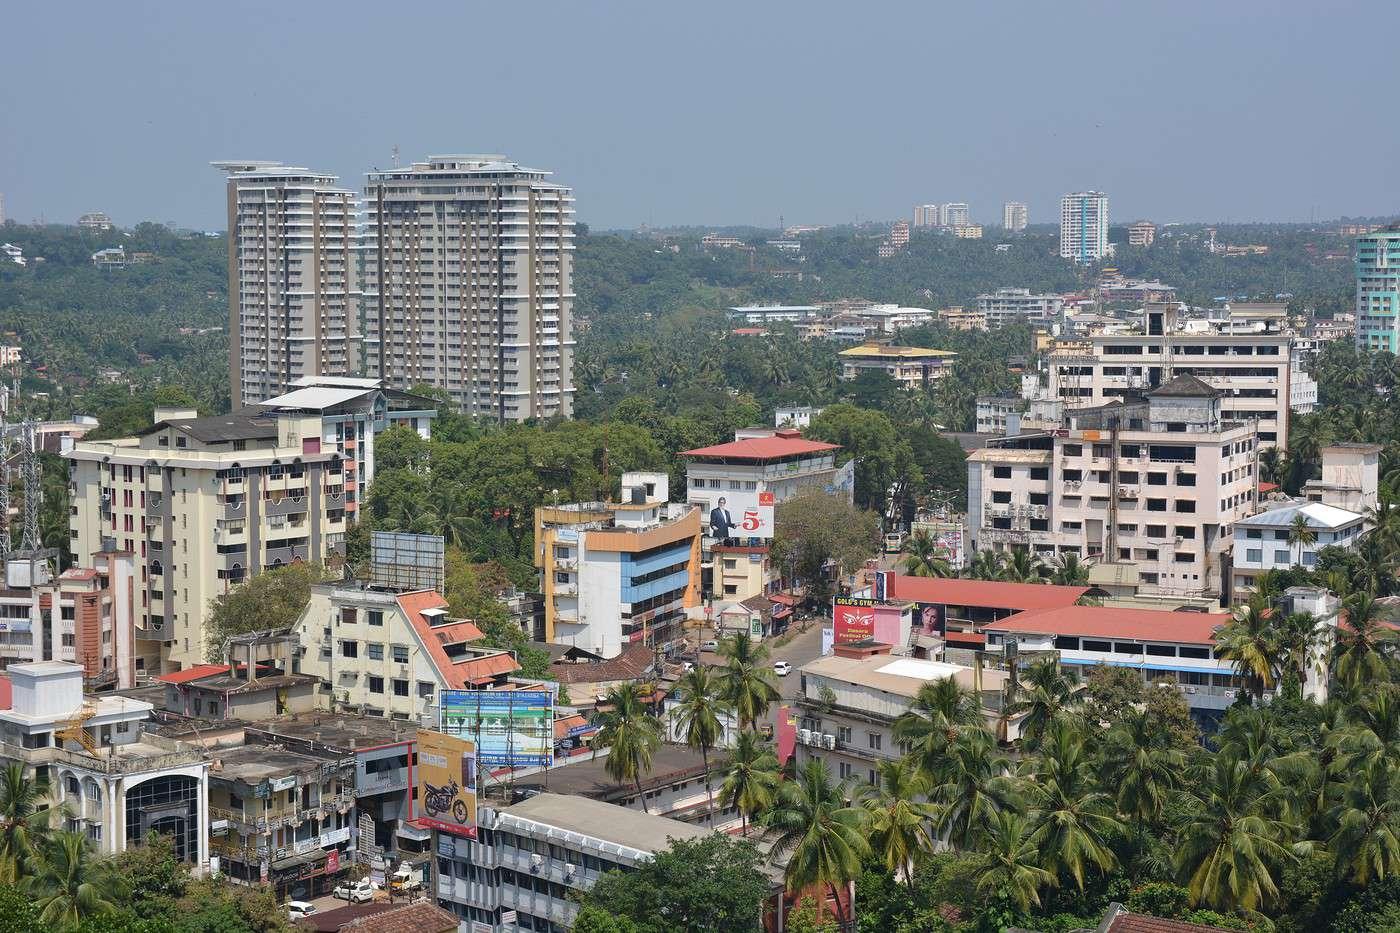 Mangalore Top View